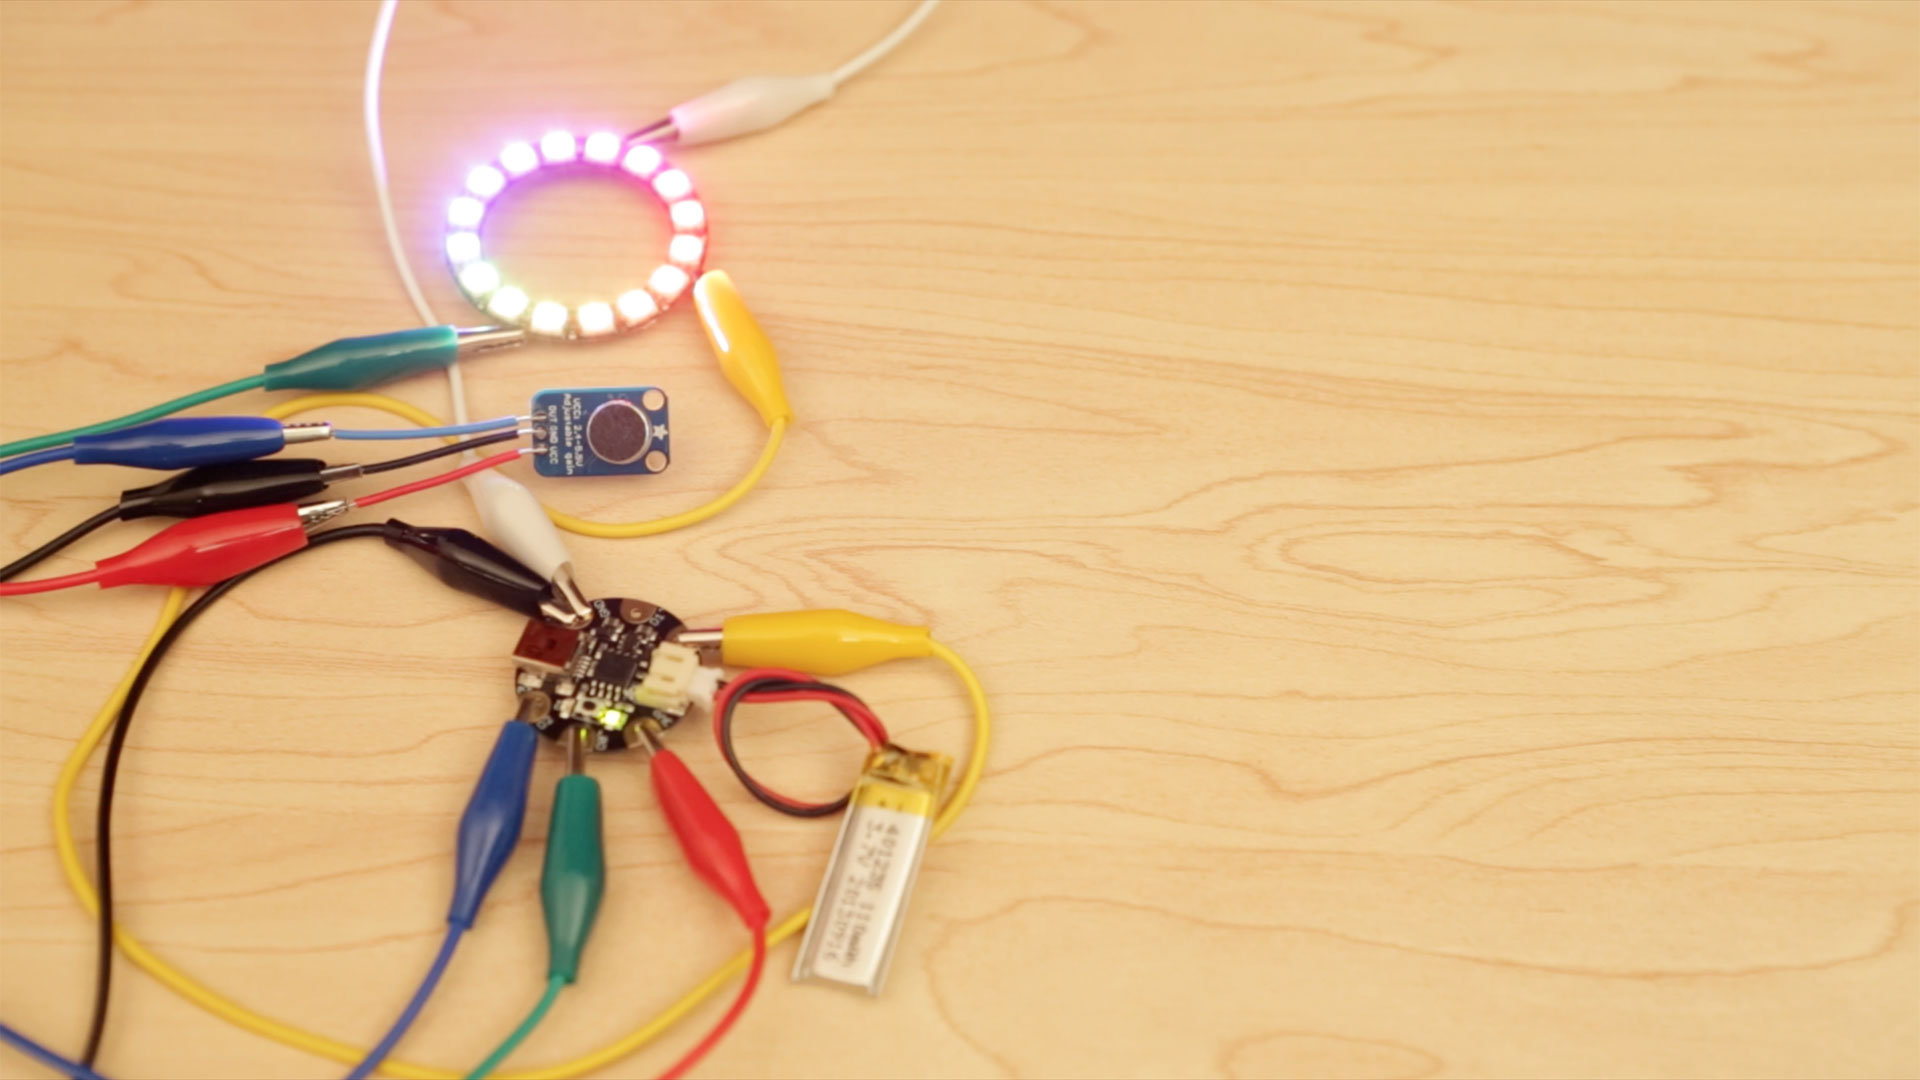 3d_printing_prototype-circuit.jpg